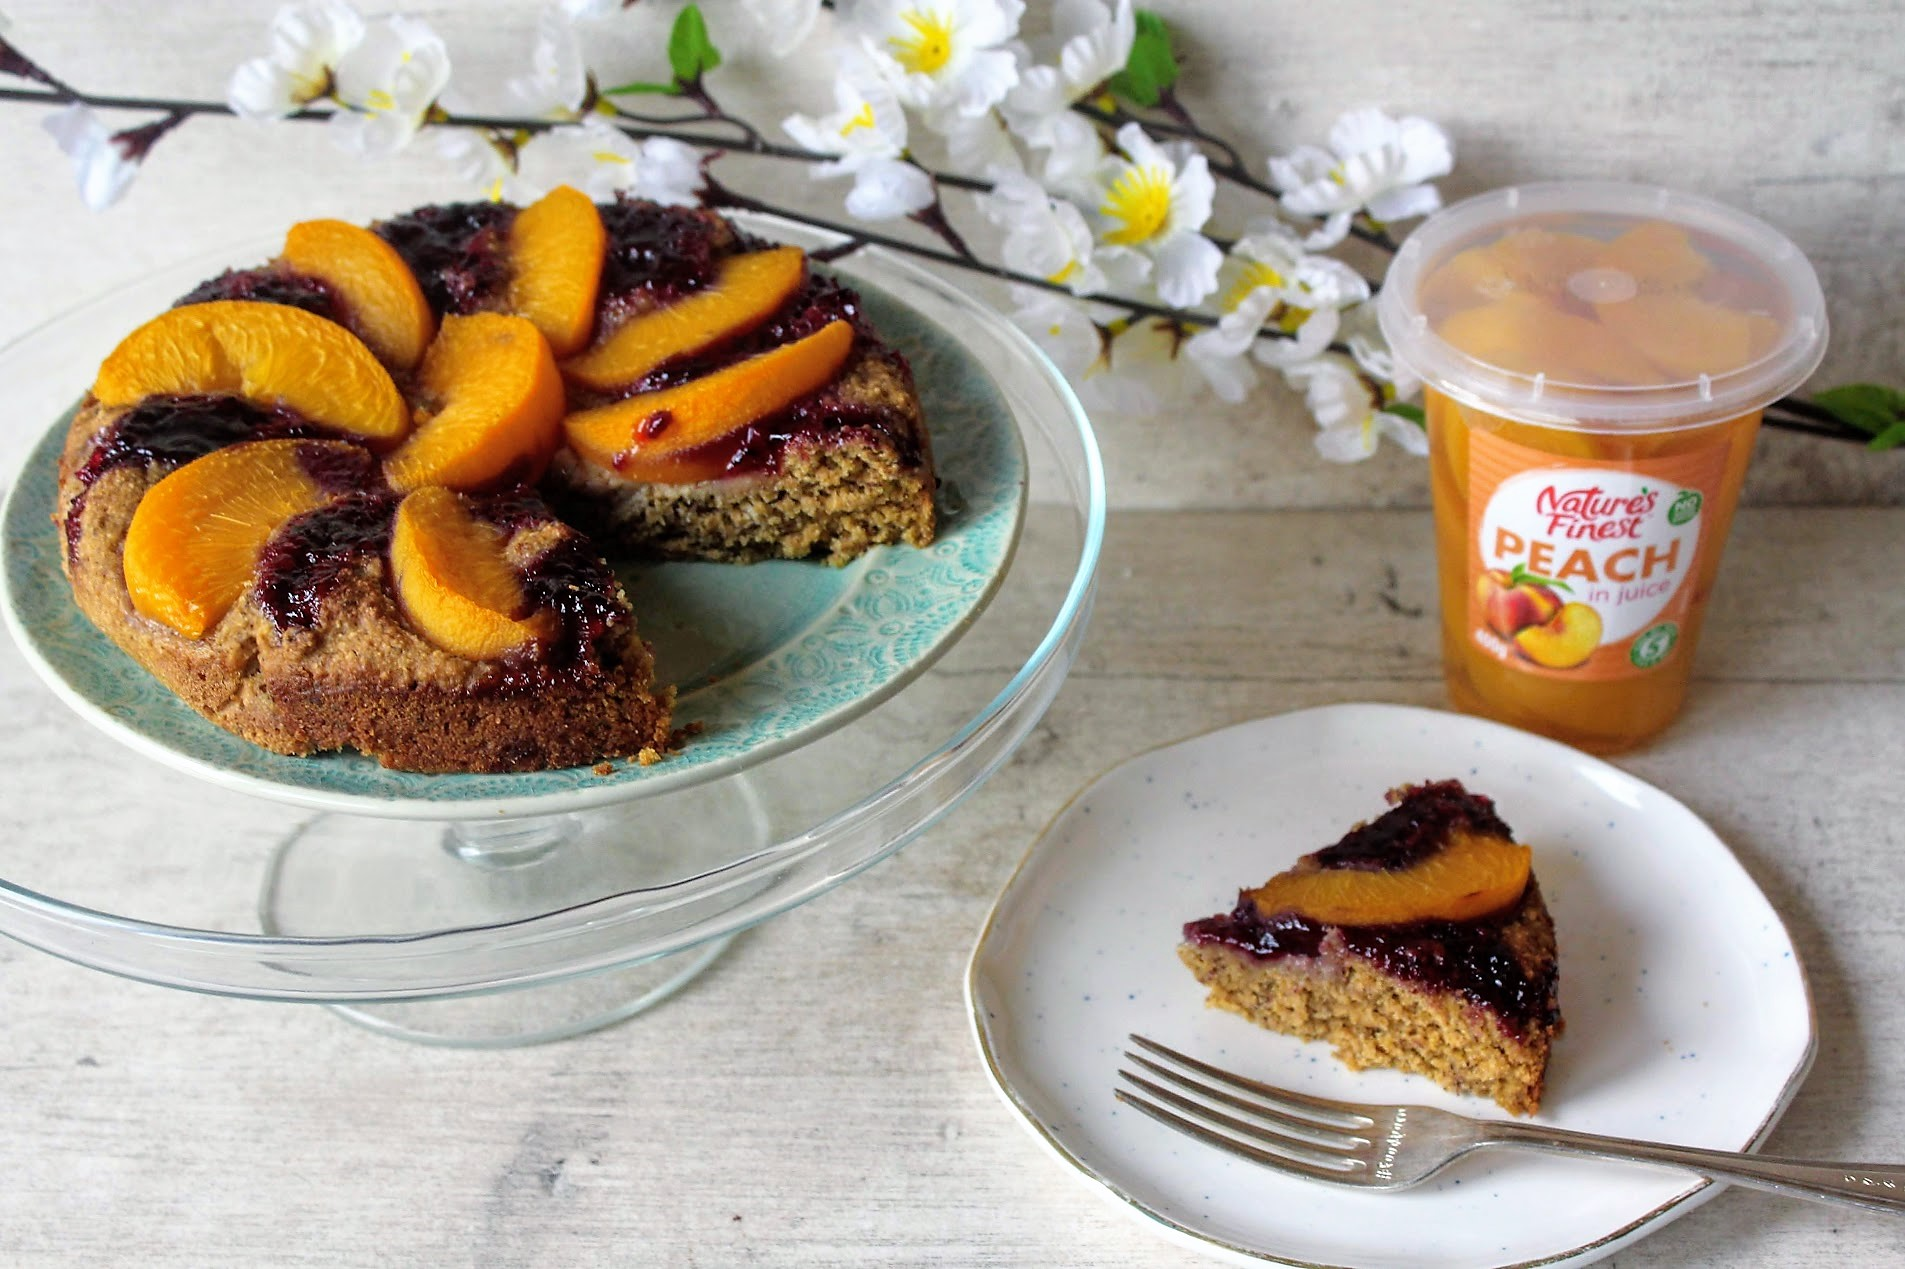 Peach Blueberry Amp Almond Cake Spamellab S Health Food Blog